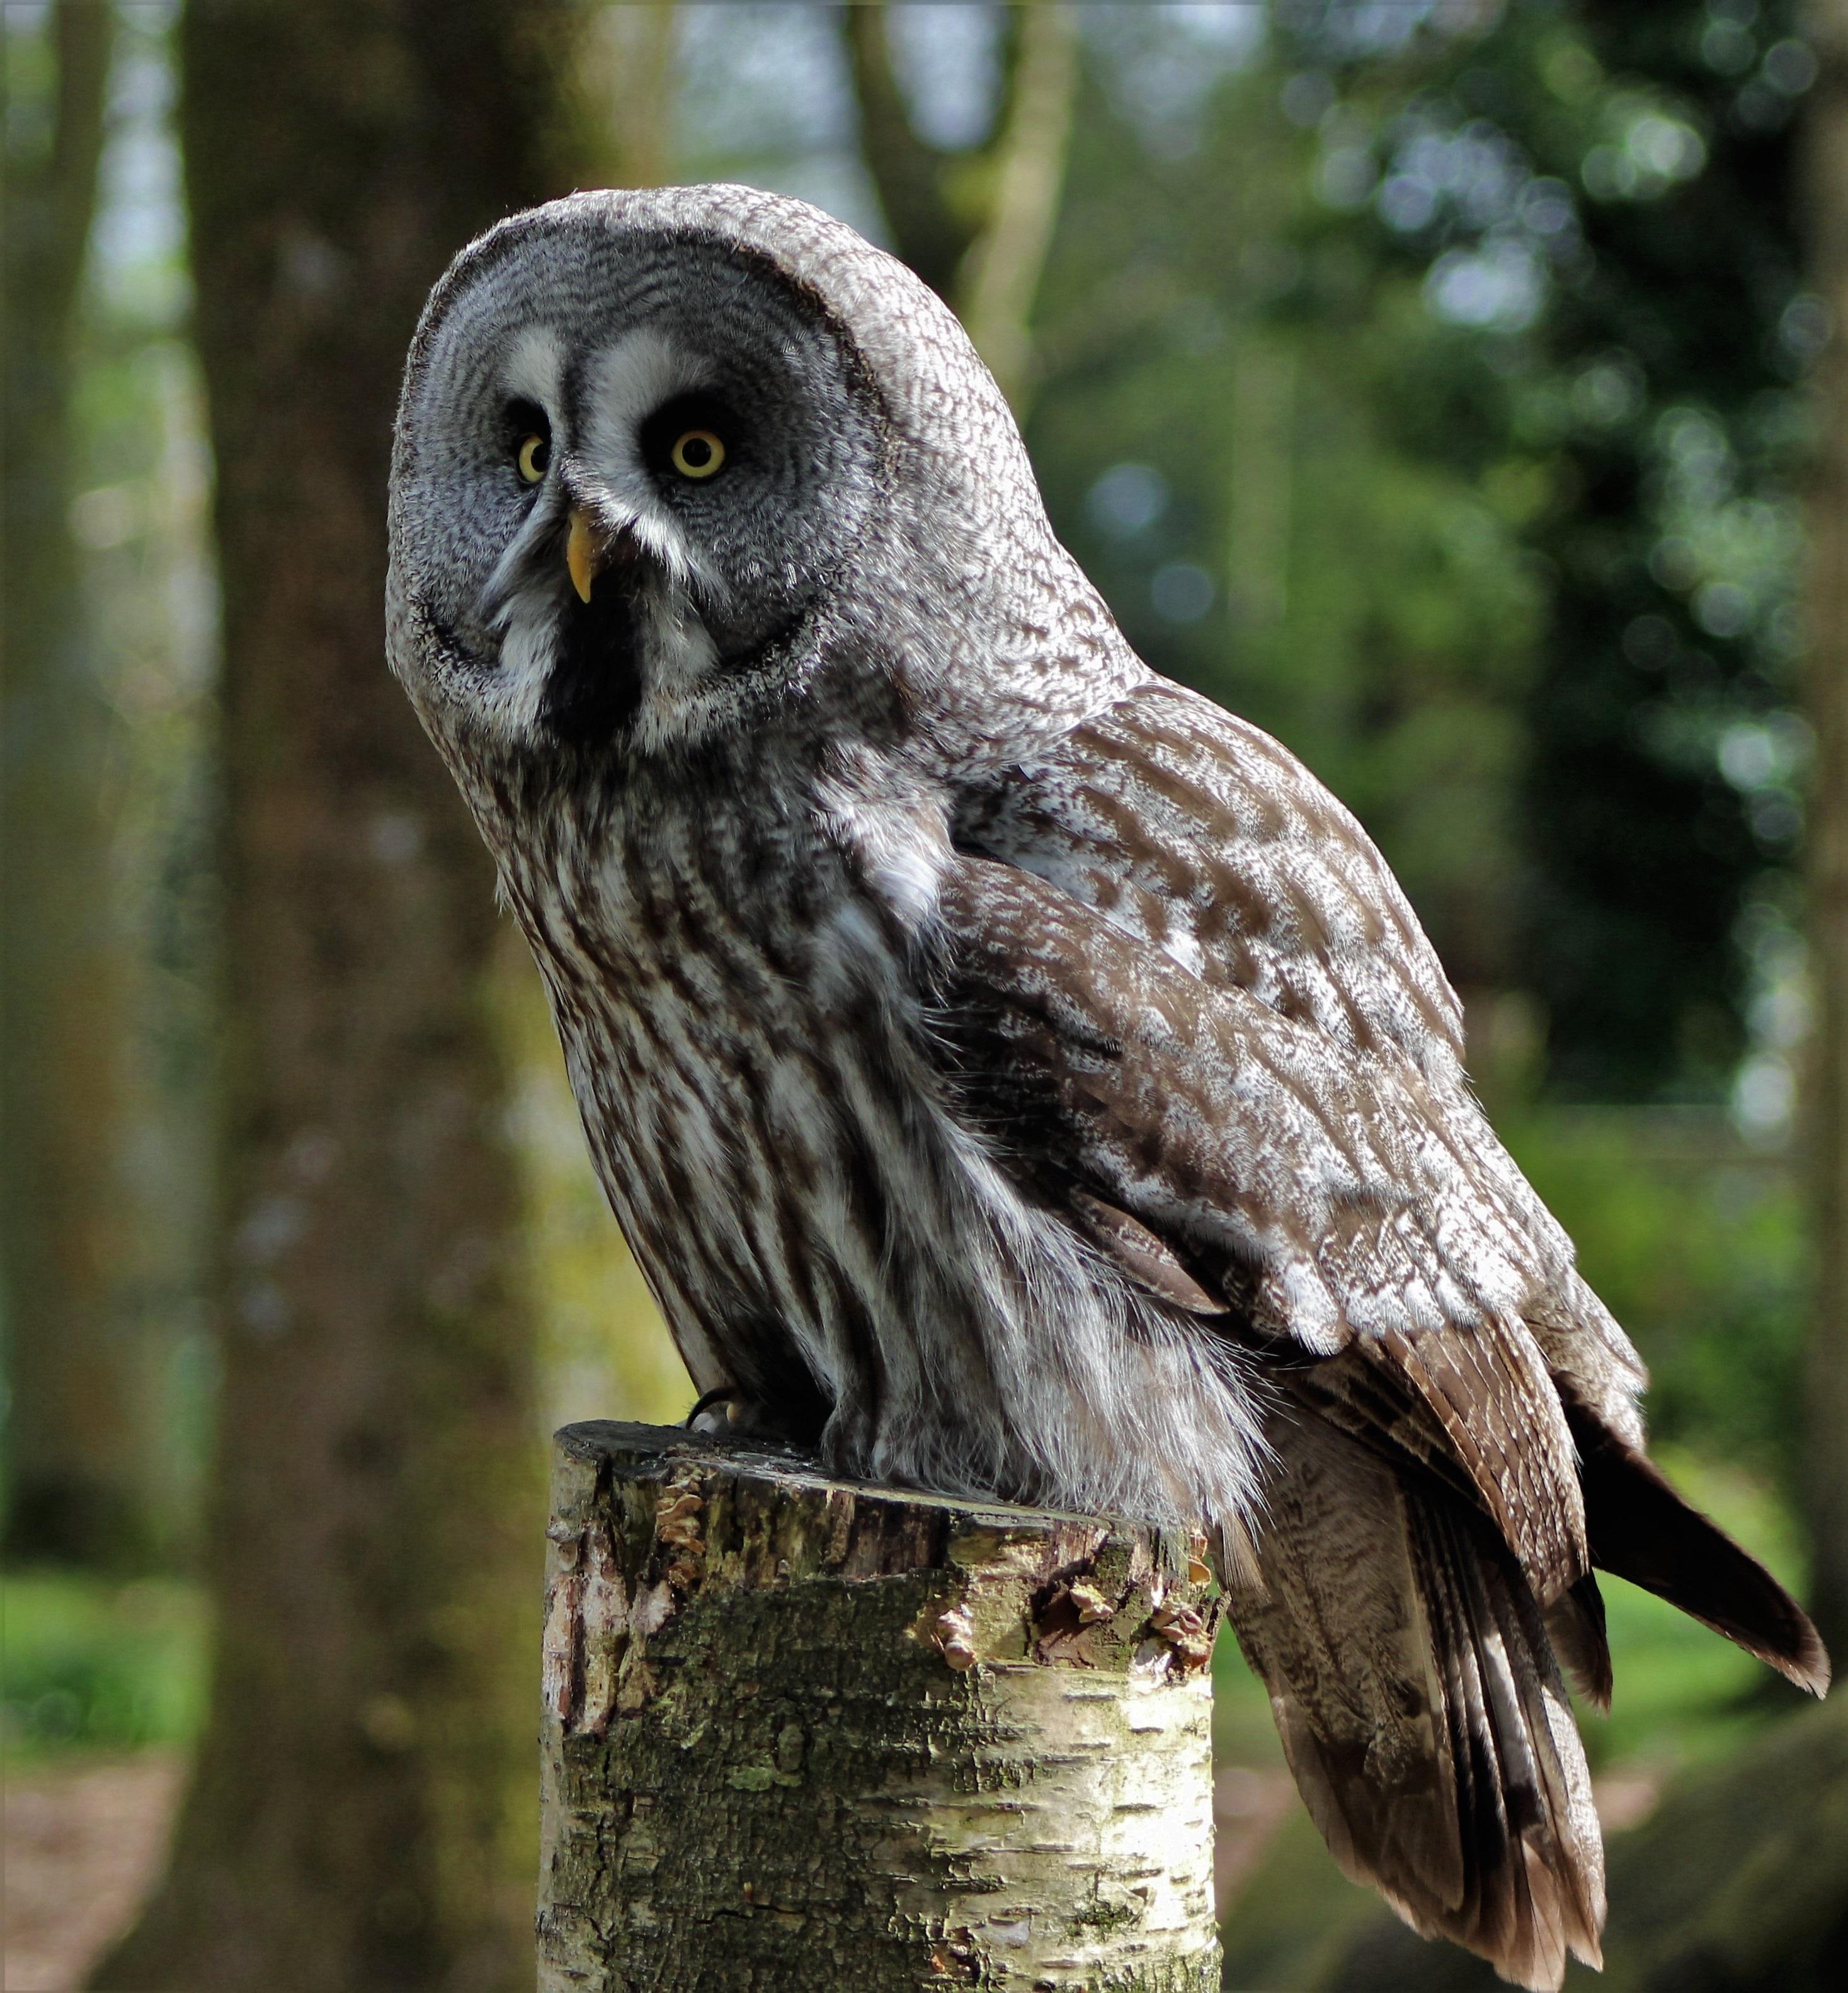 600+ Foto Gambar Burung Hantu HD Paling Keren Free